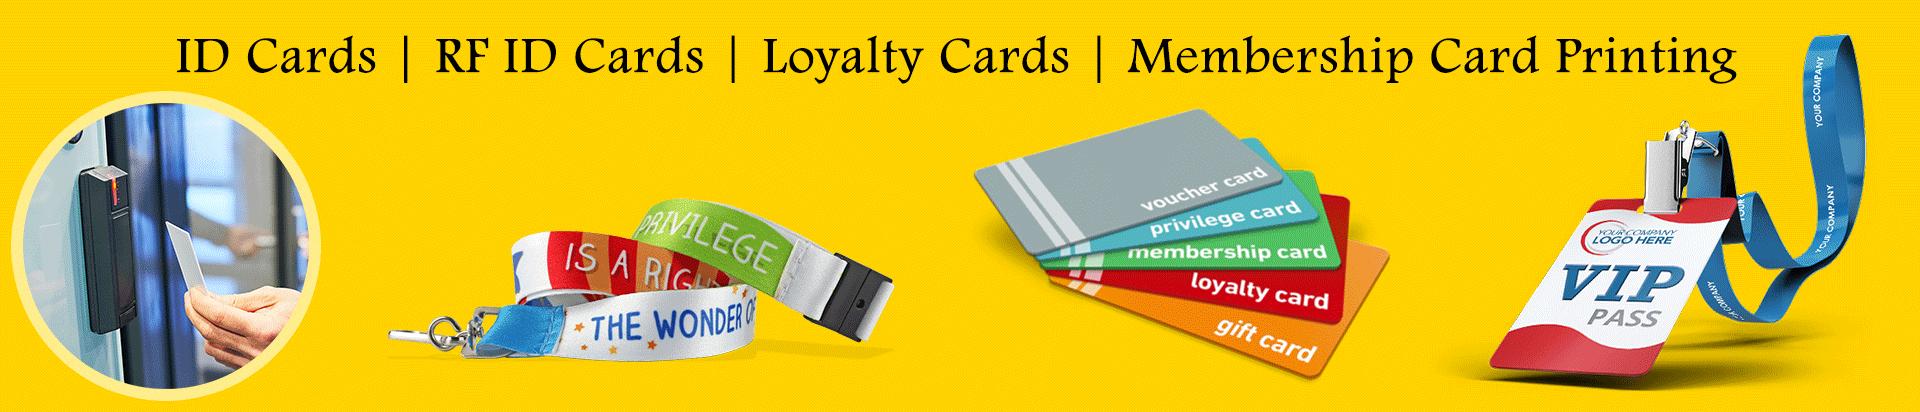 ID-Cards,-School-ID-Cards,-RFID-Cards,-Loyalty-Cards,-Membership-Card-Printing